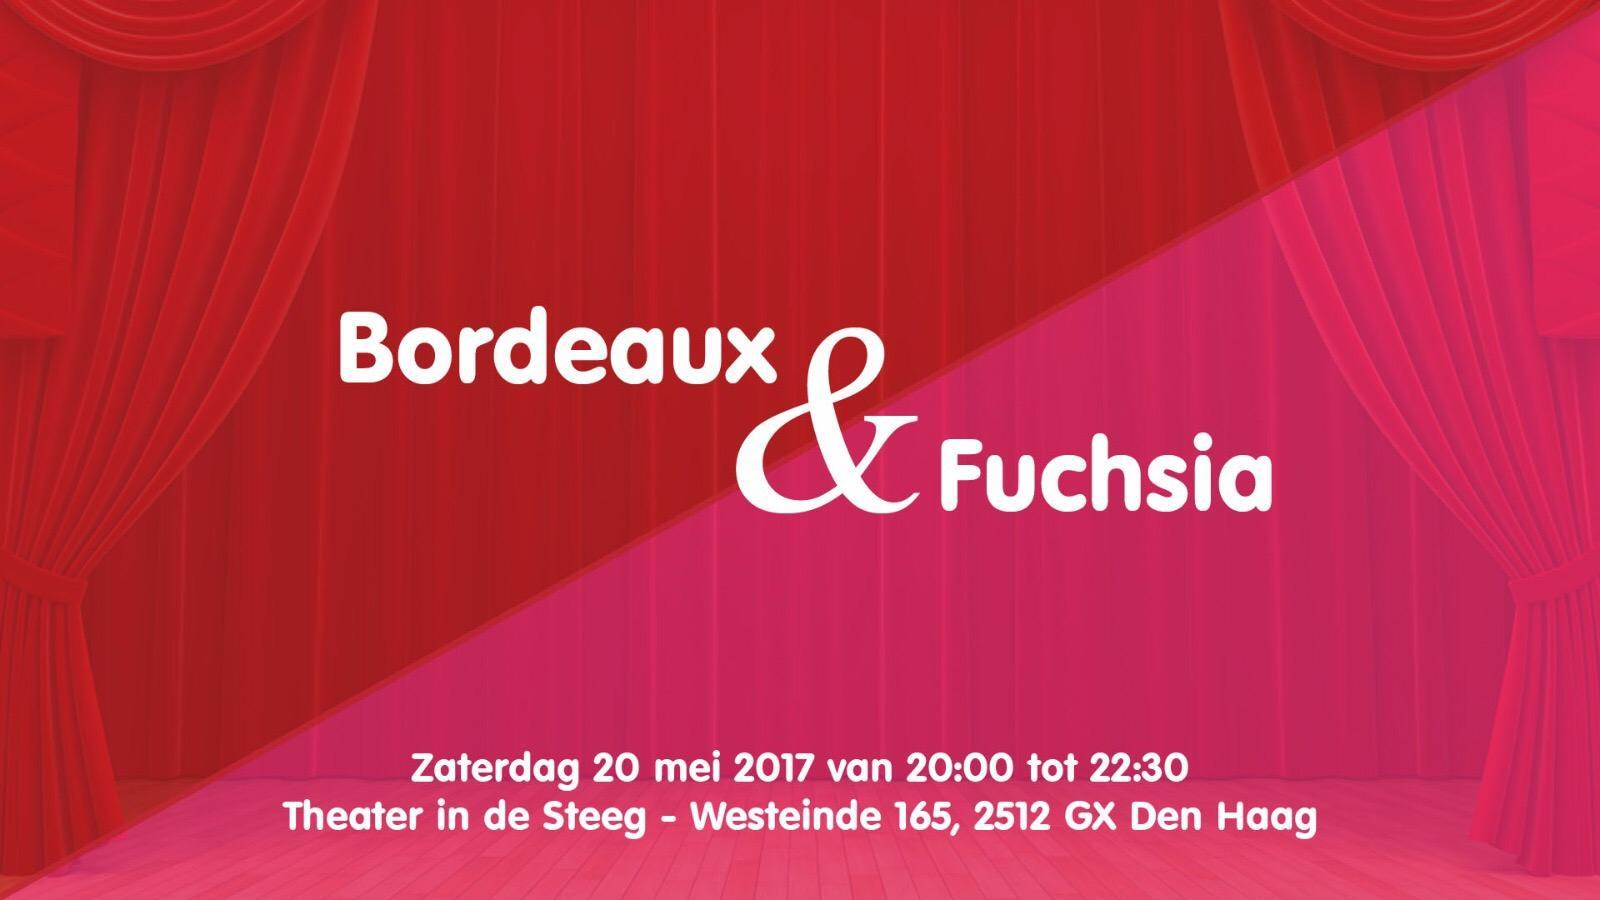 Bordeaux & Fuchsia